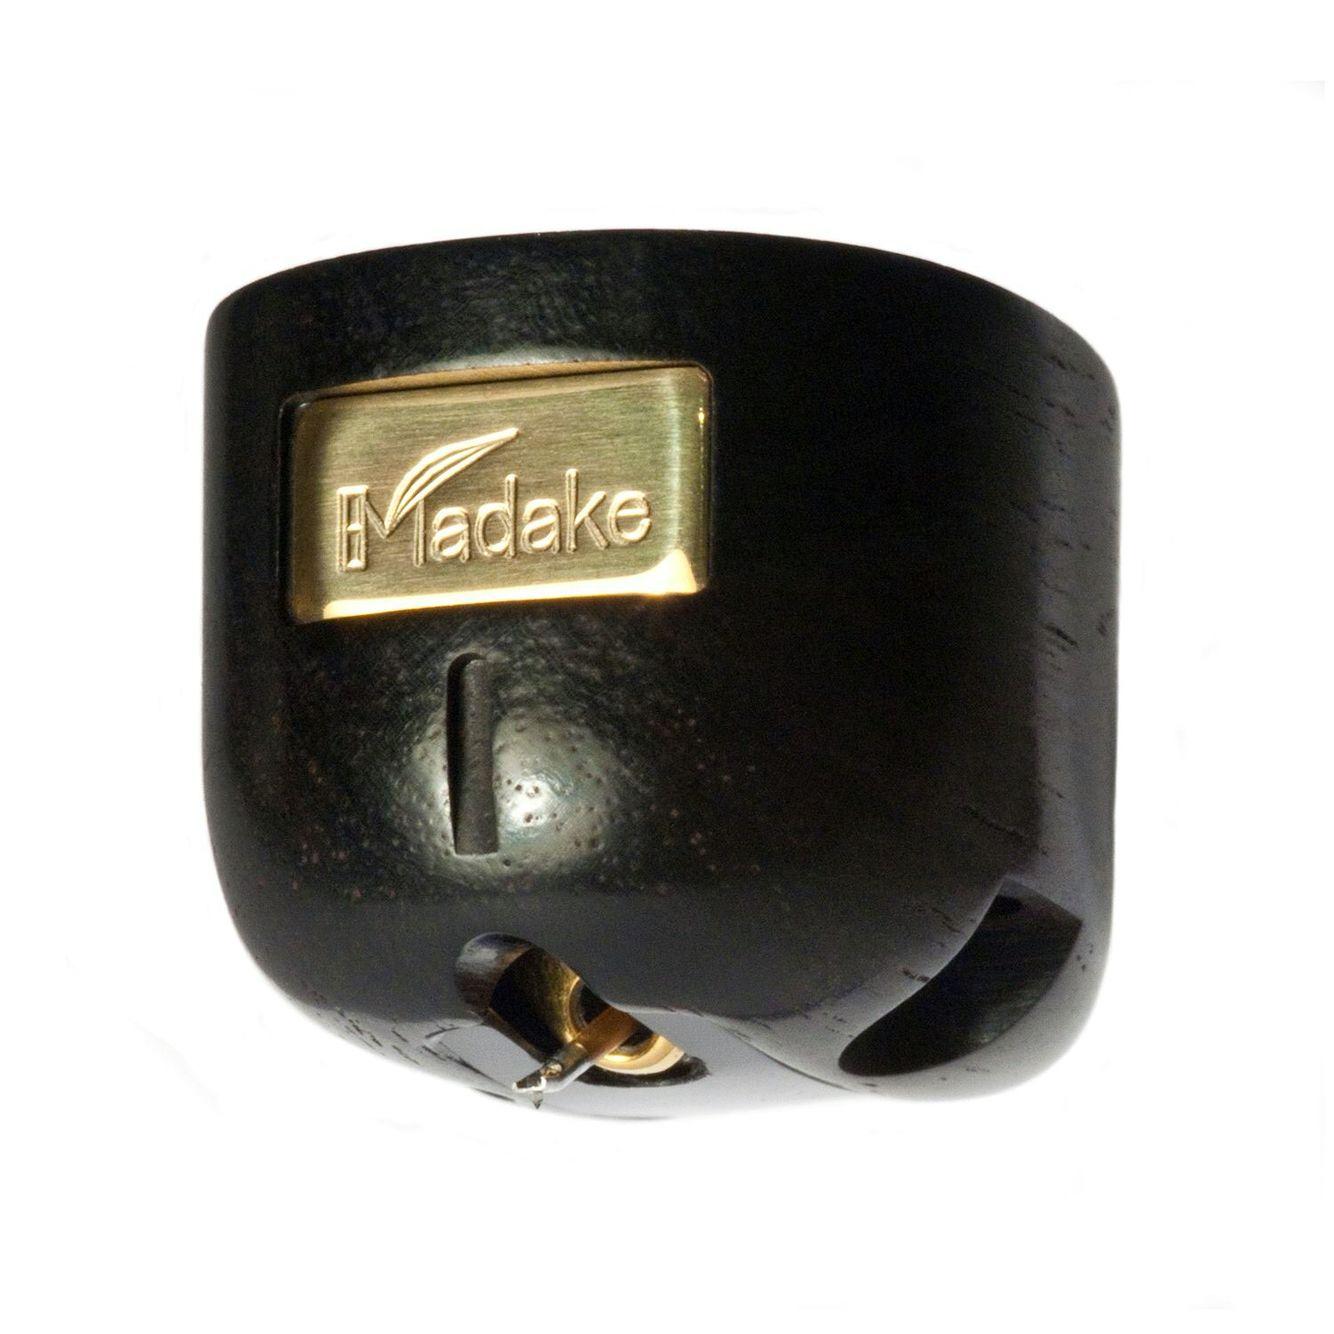 AUDIOPHILE MAN - HIFI NEWS: Miyajima Madake cartridge Miyajima's newest top-of-the-range stereo cartridge, the Madake, is now available in the UK. To read more about it, click www.theaudiophileman.com